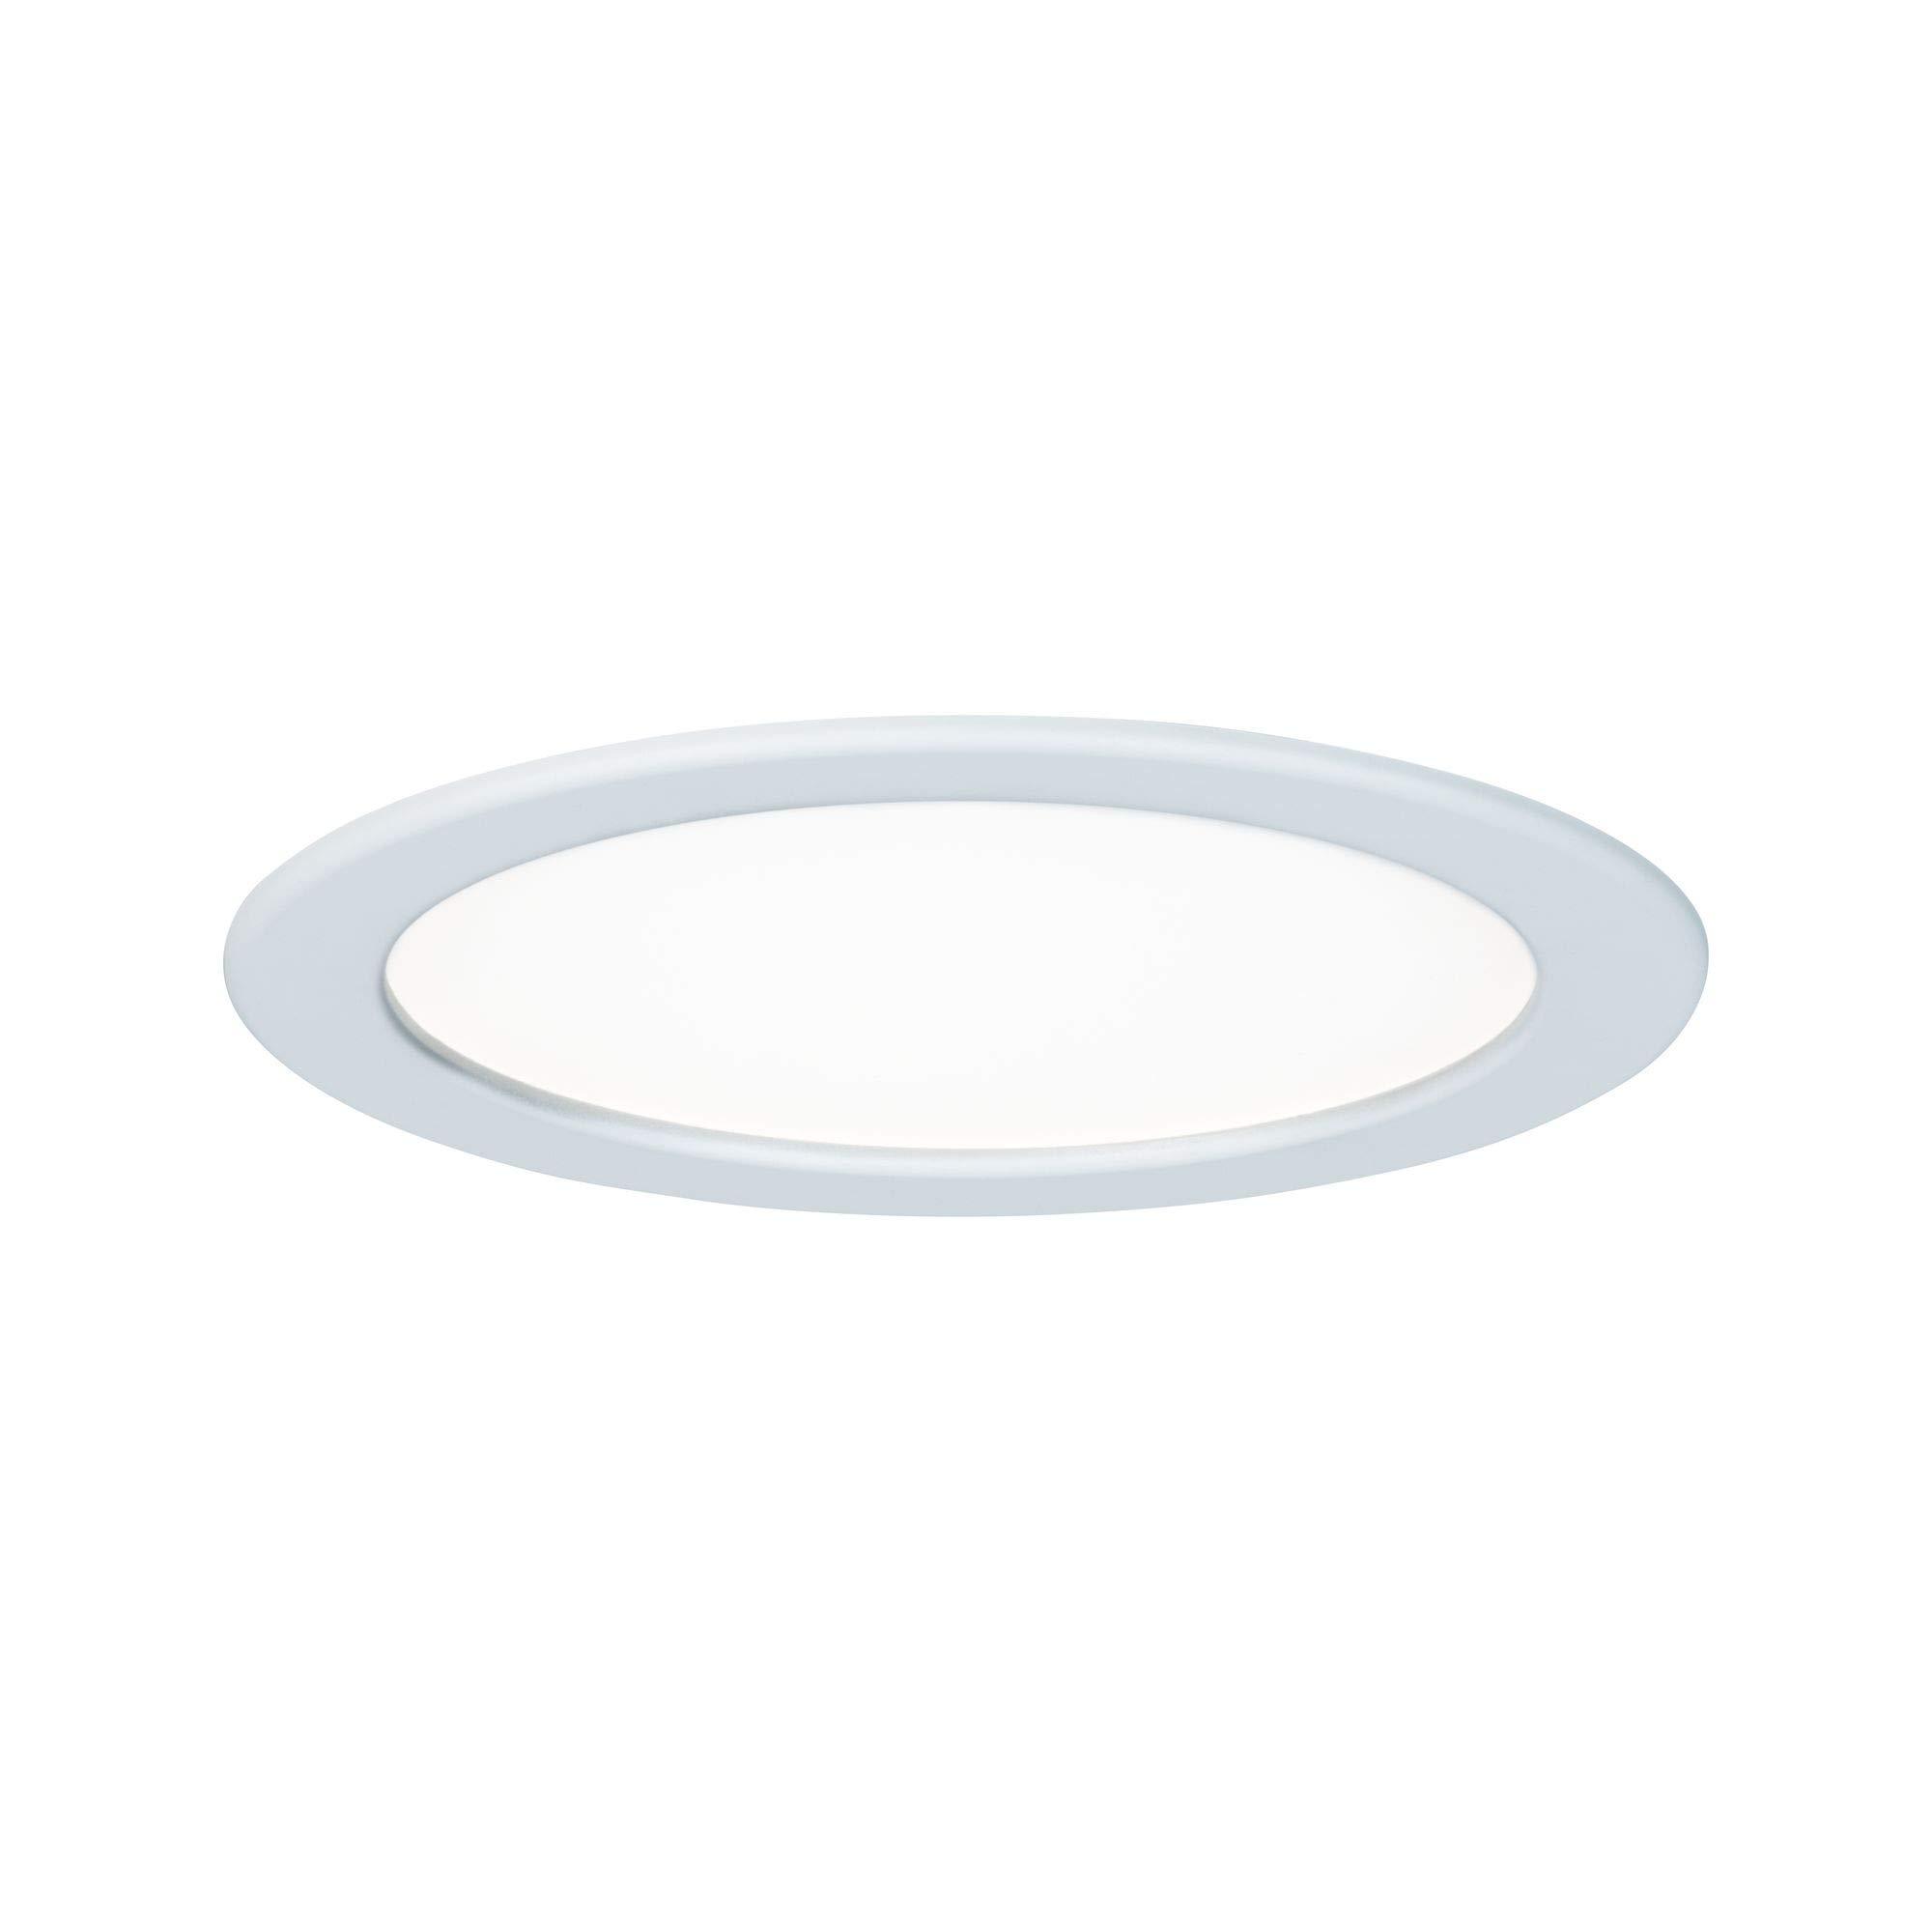 Paulmann Paulmann Leuchten Paulmann 92060 安装面板圆形吸顶灯 18W 光 4000K 中性白 LED 面板白色 IP44 防溅水 包括灯具安装灯,塑料,18 W